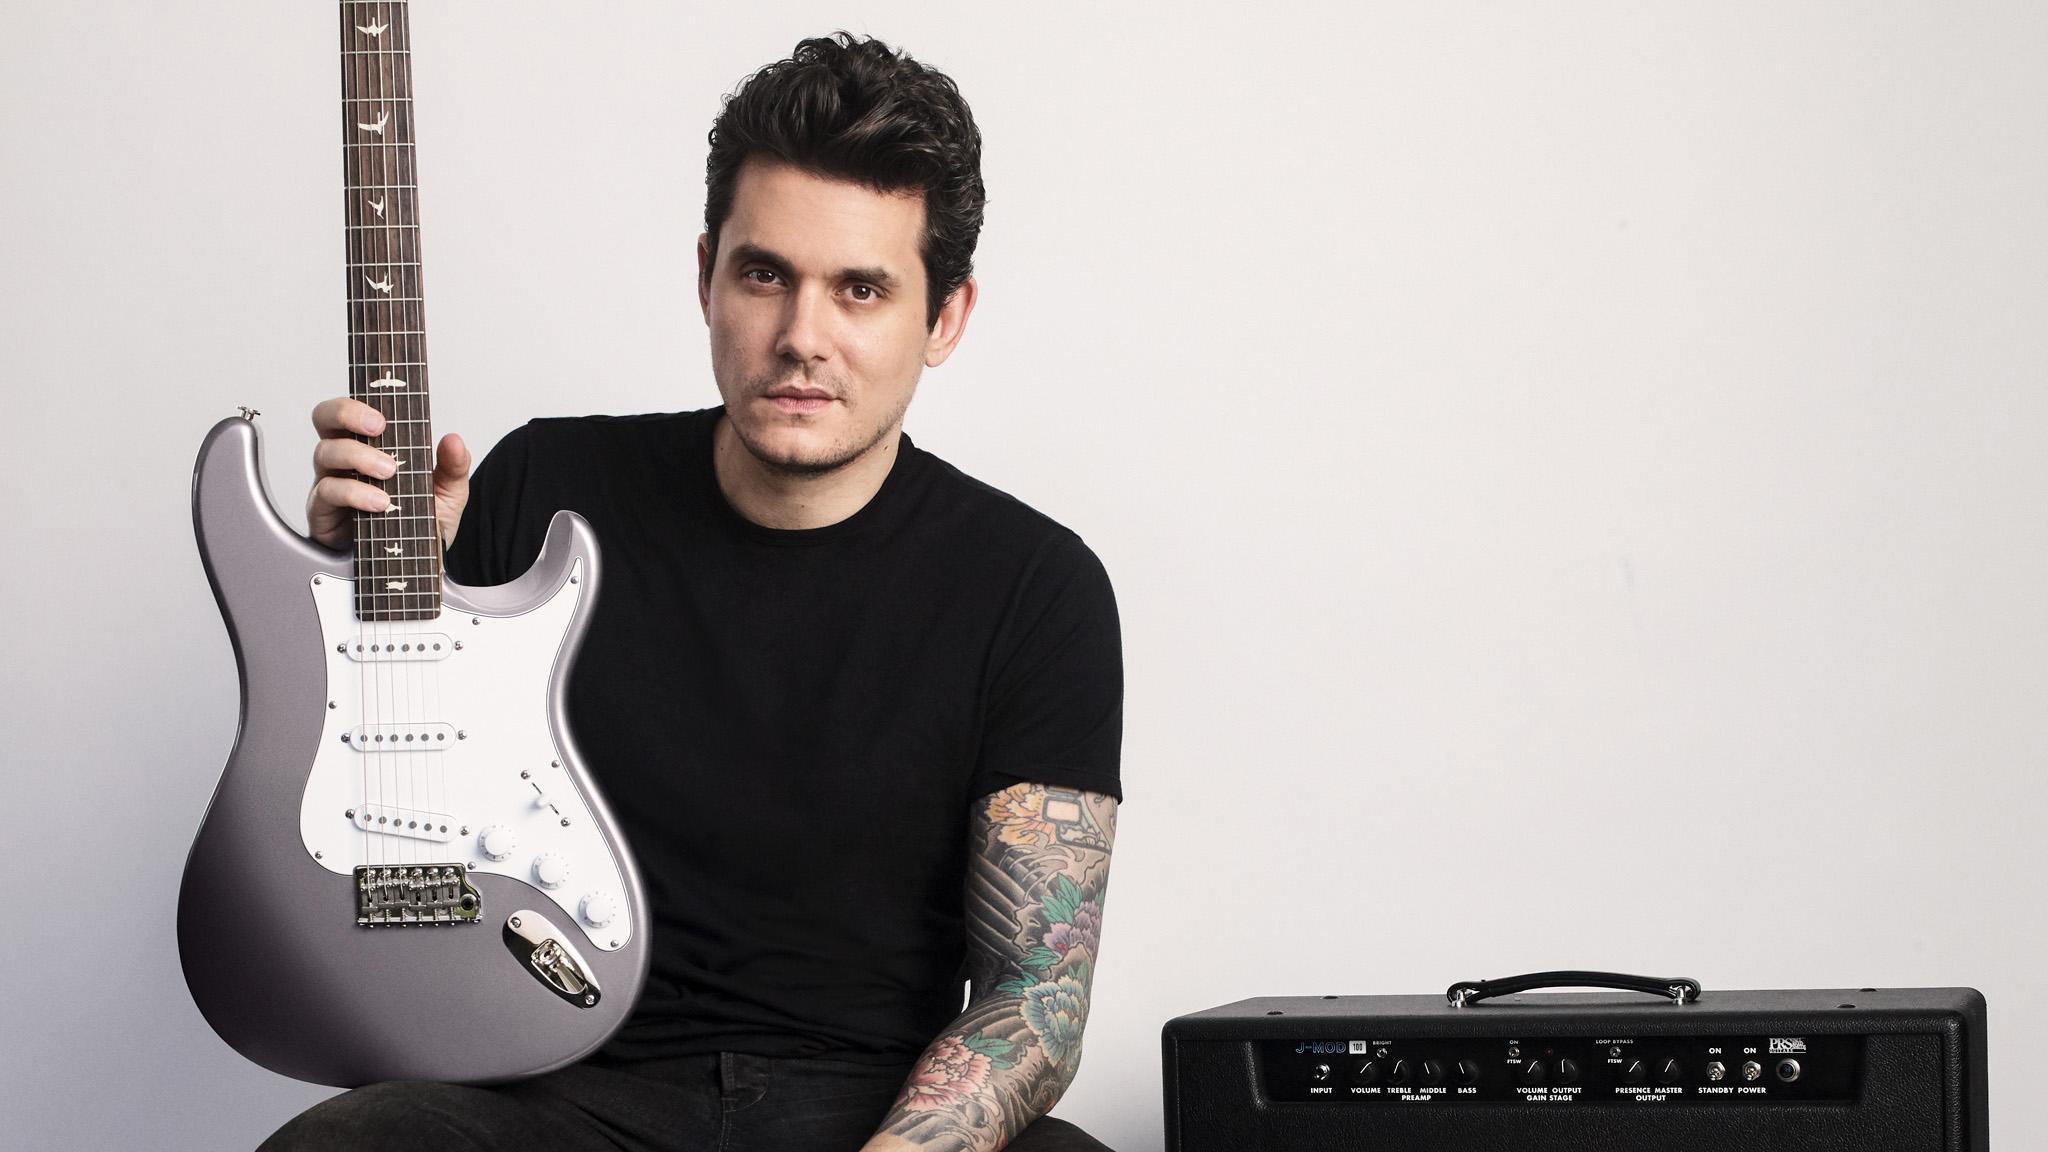 John Mayer finally announces his Strat-inspired PRS, the Silver Sky